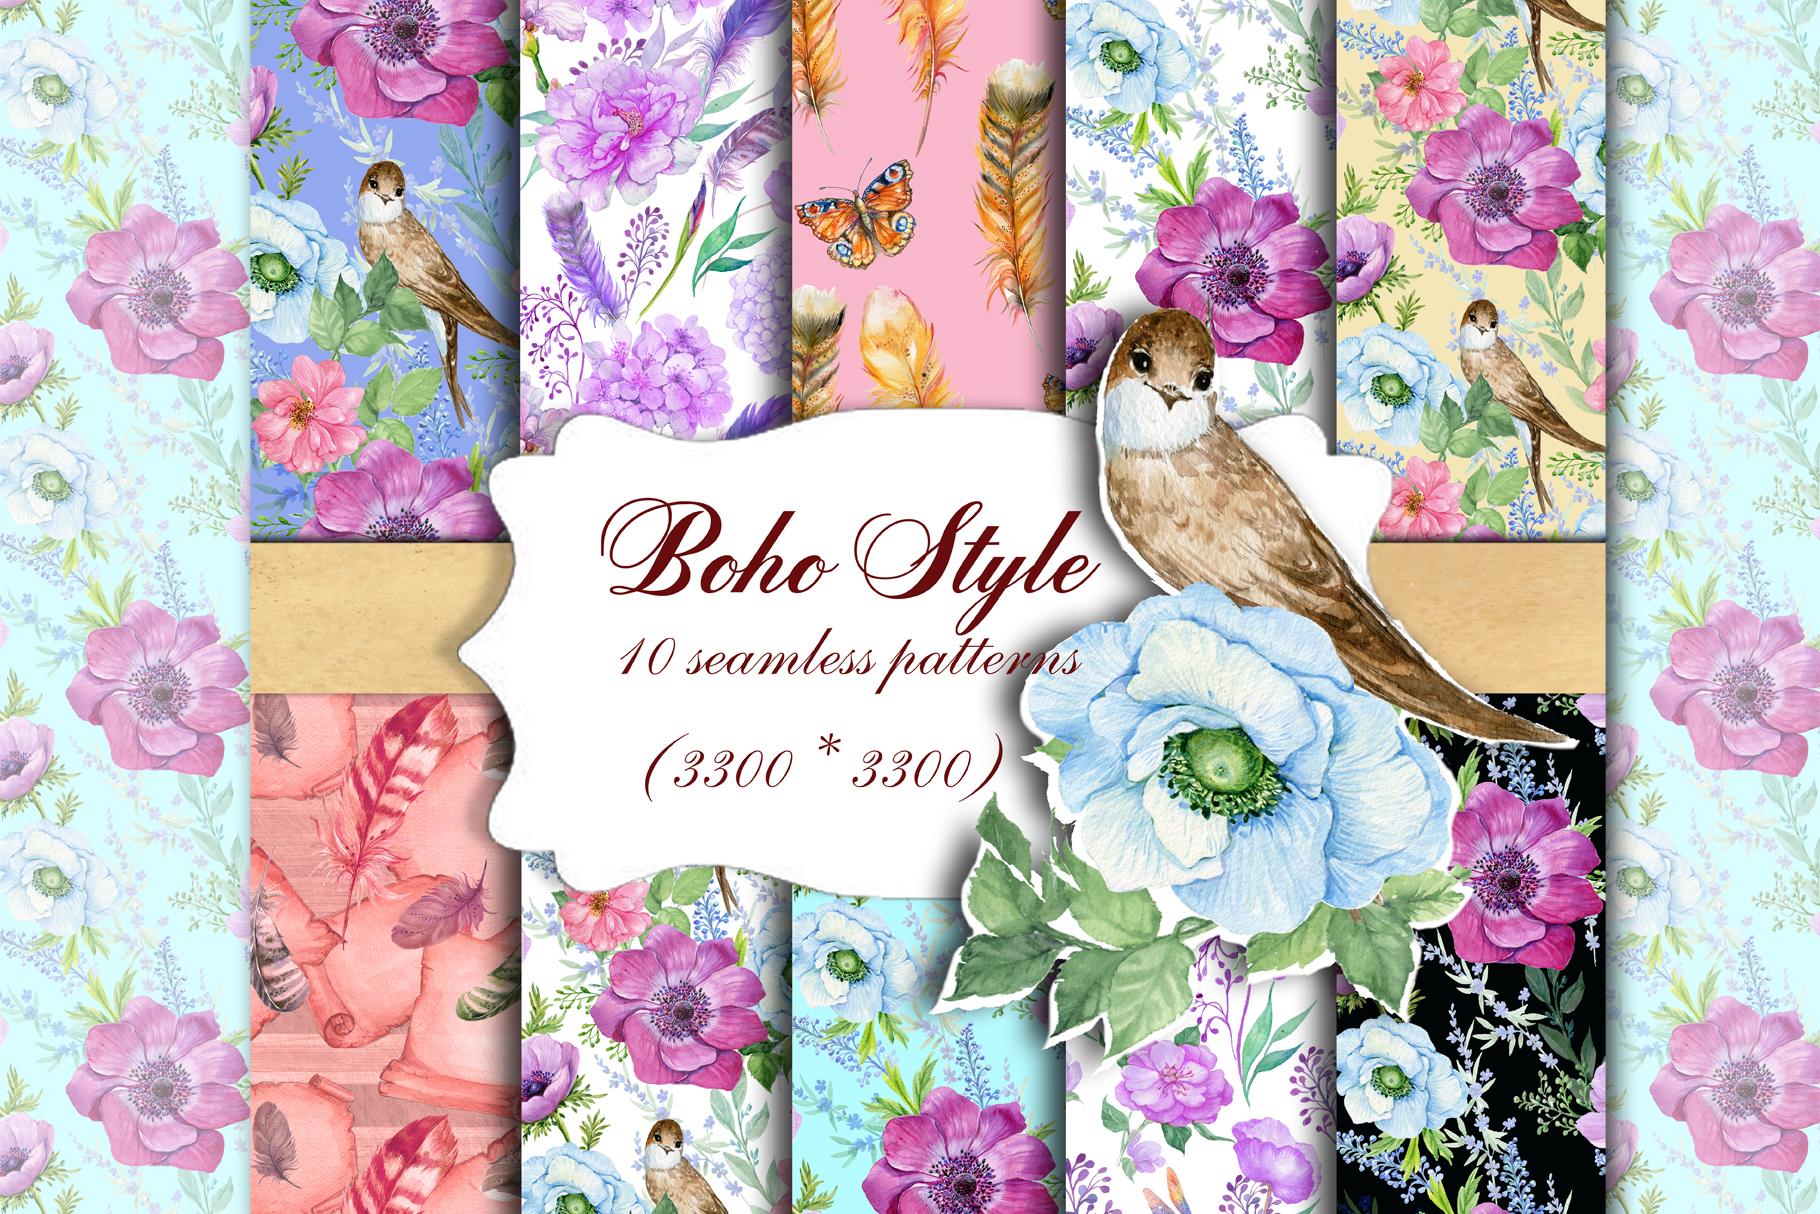 Boho Style Seamless Patterns Decorative Paper, Seamless Pattern,Scrapbooking ,Watercolor Pattern,Flowers